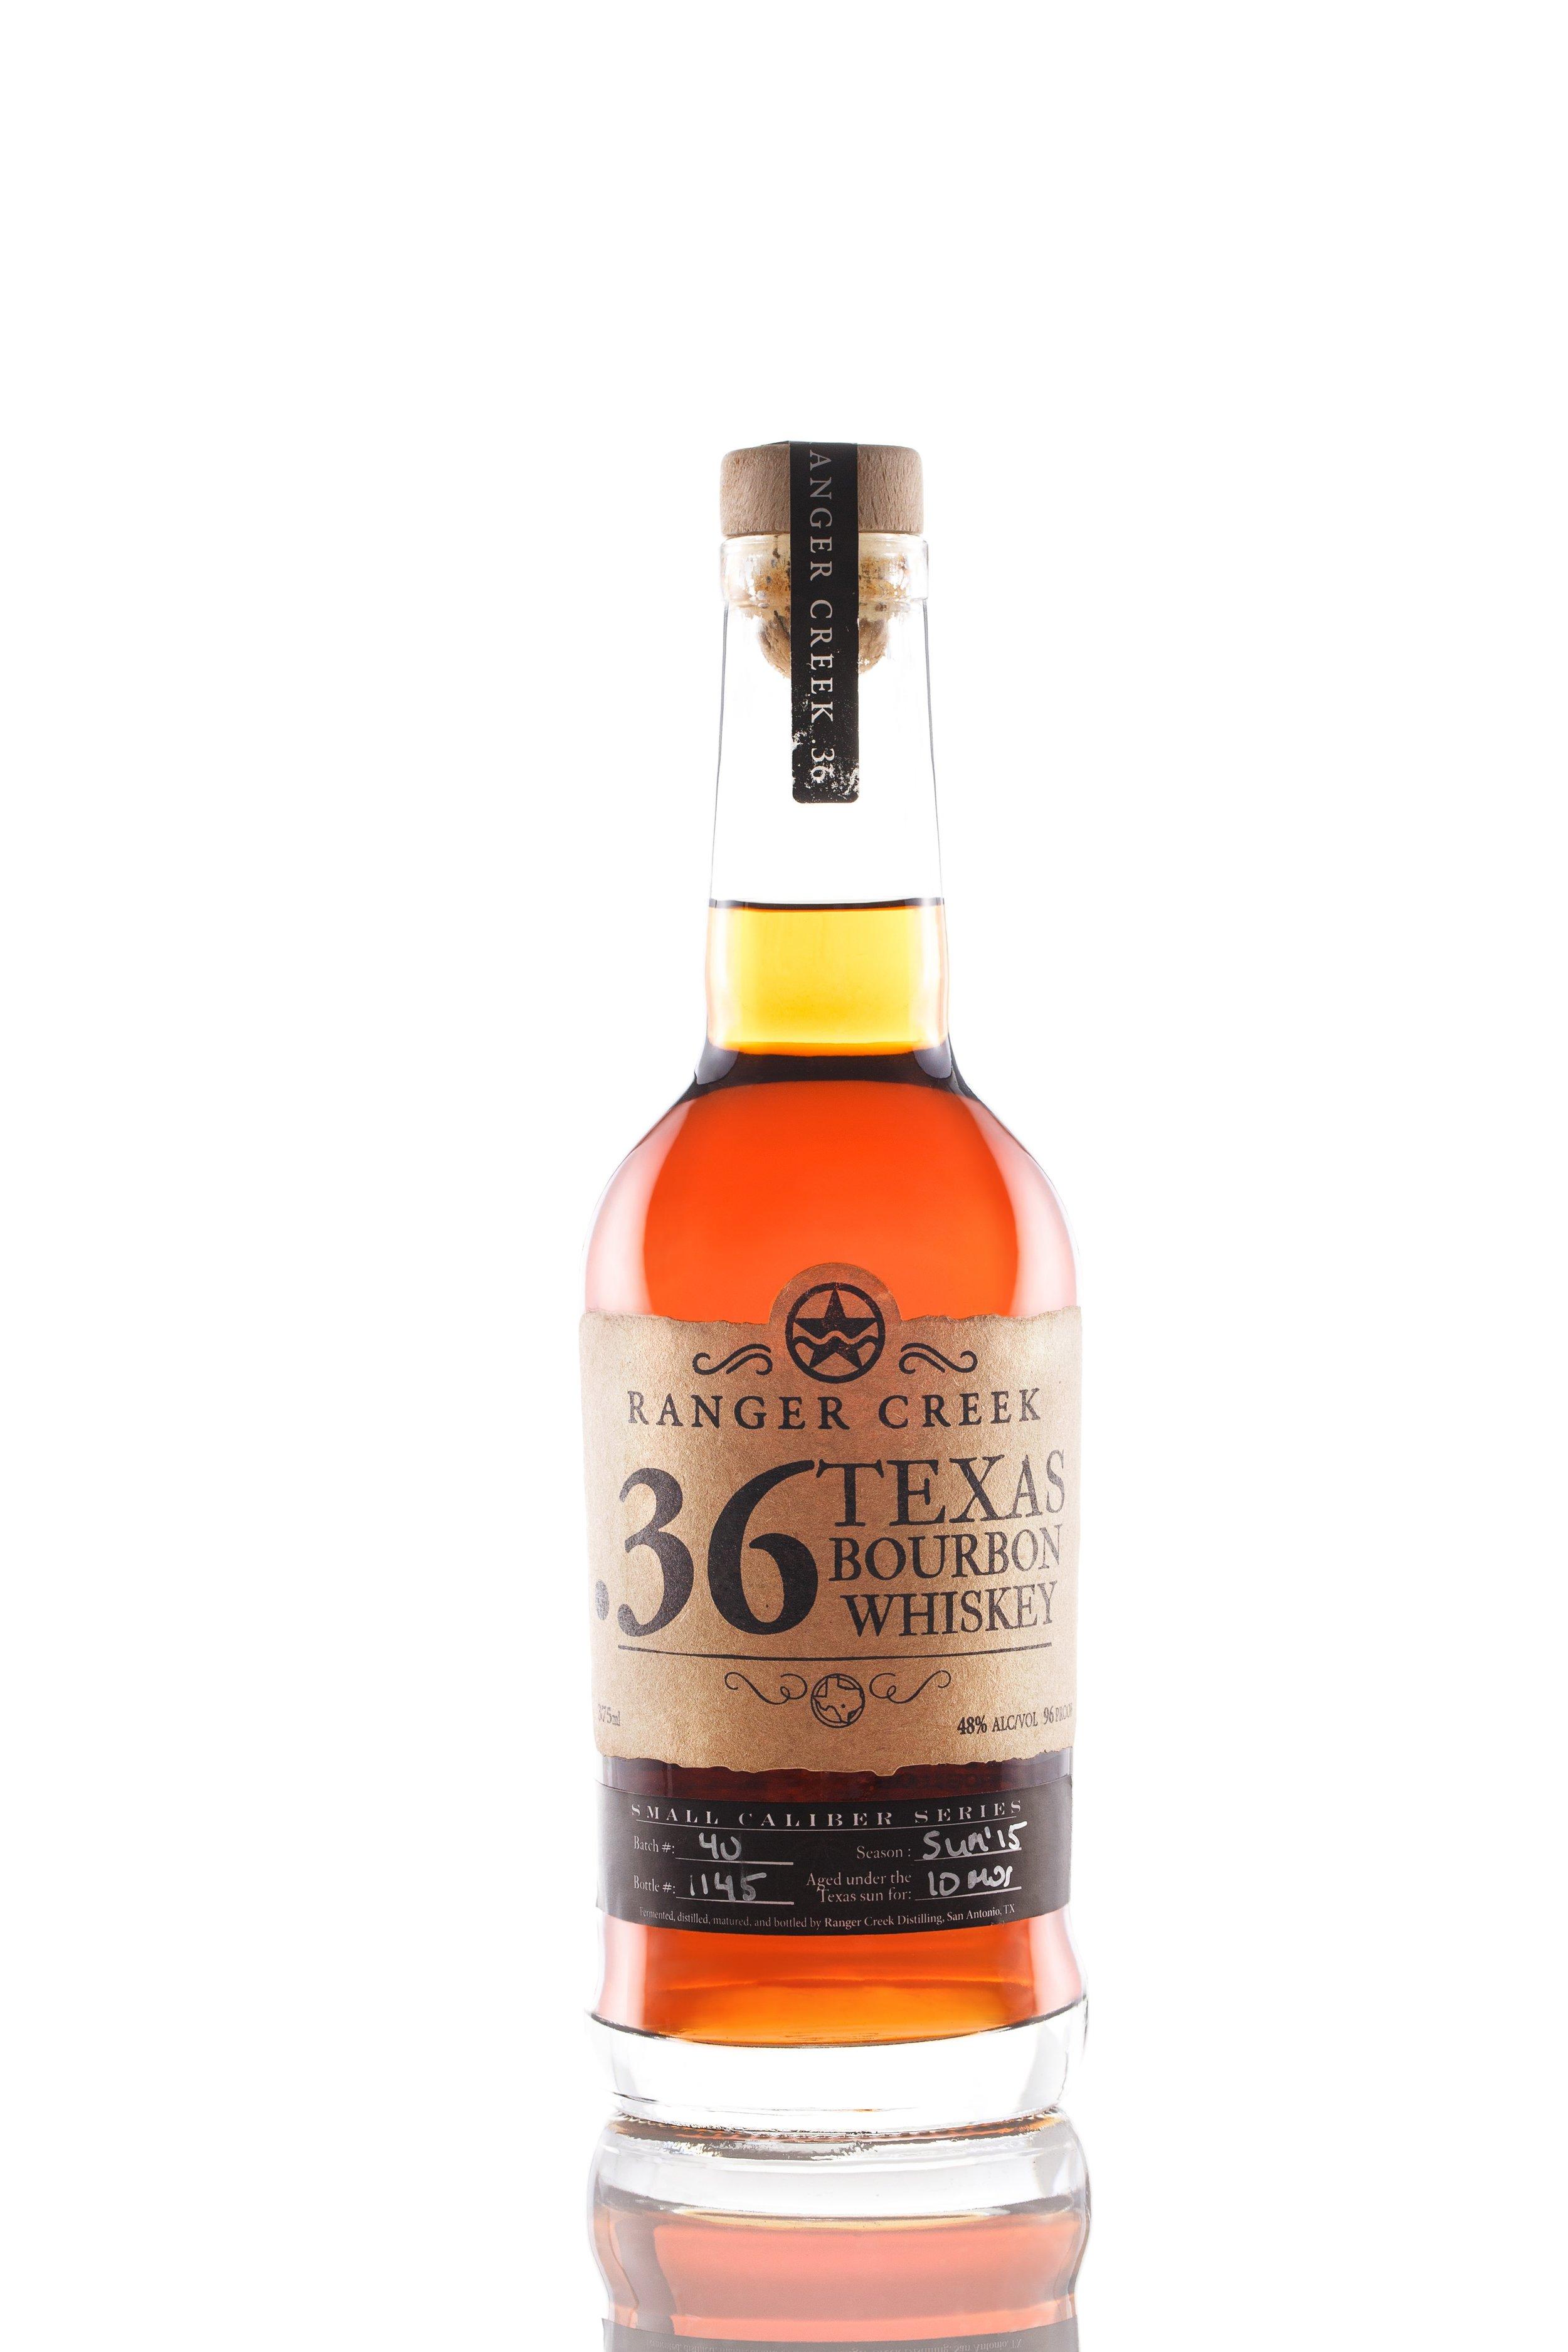 .36 Bourbon - Small Caliber Series